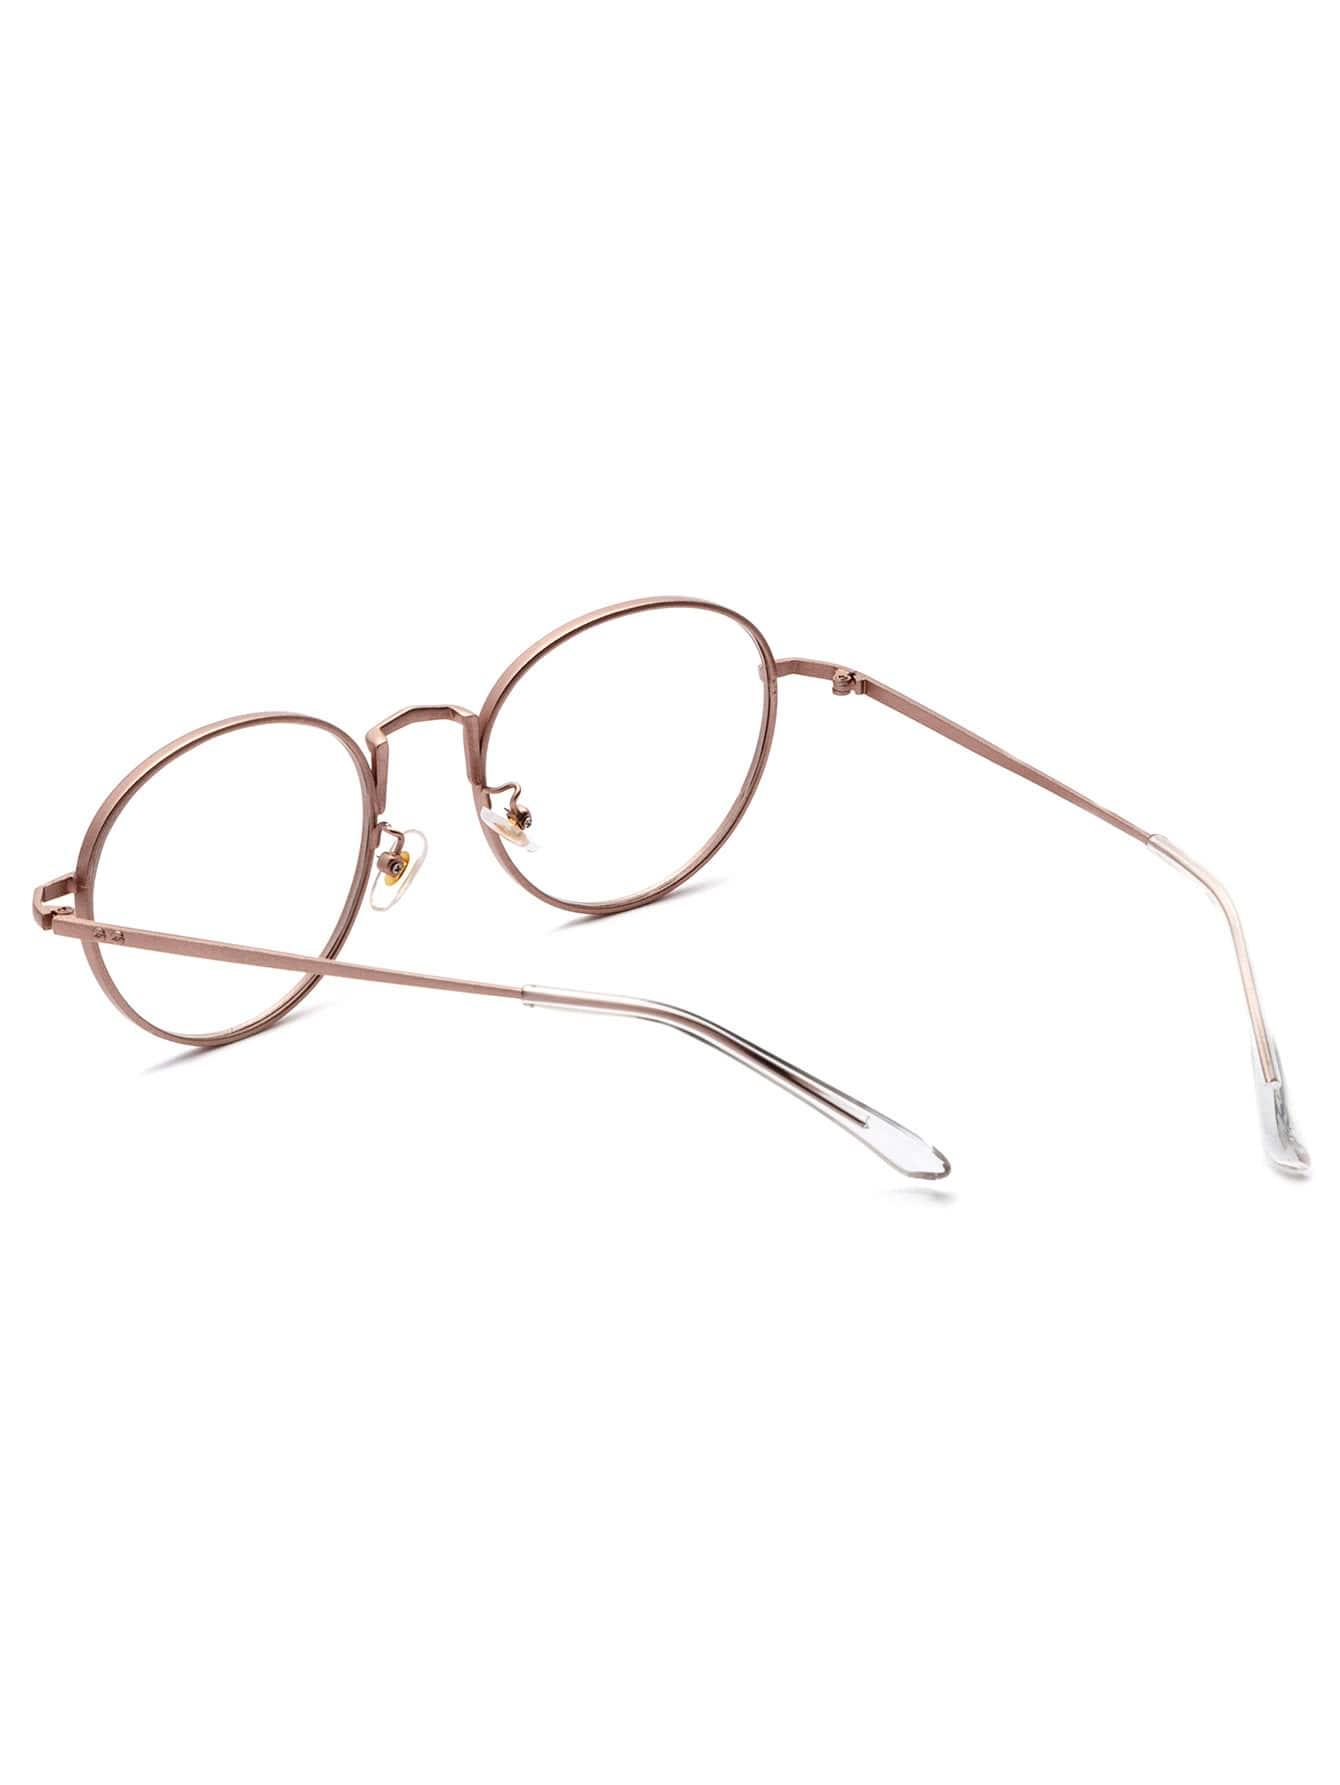 rose gold delicate frame clear lens glasses sunglass161011308_1 sunglass161011308_1 sunglass161011308_2 sunglass161011308_2 sunglass161011308_2